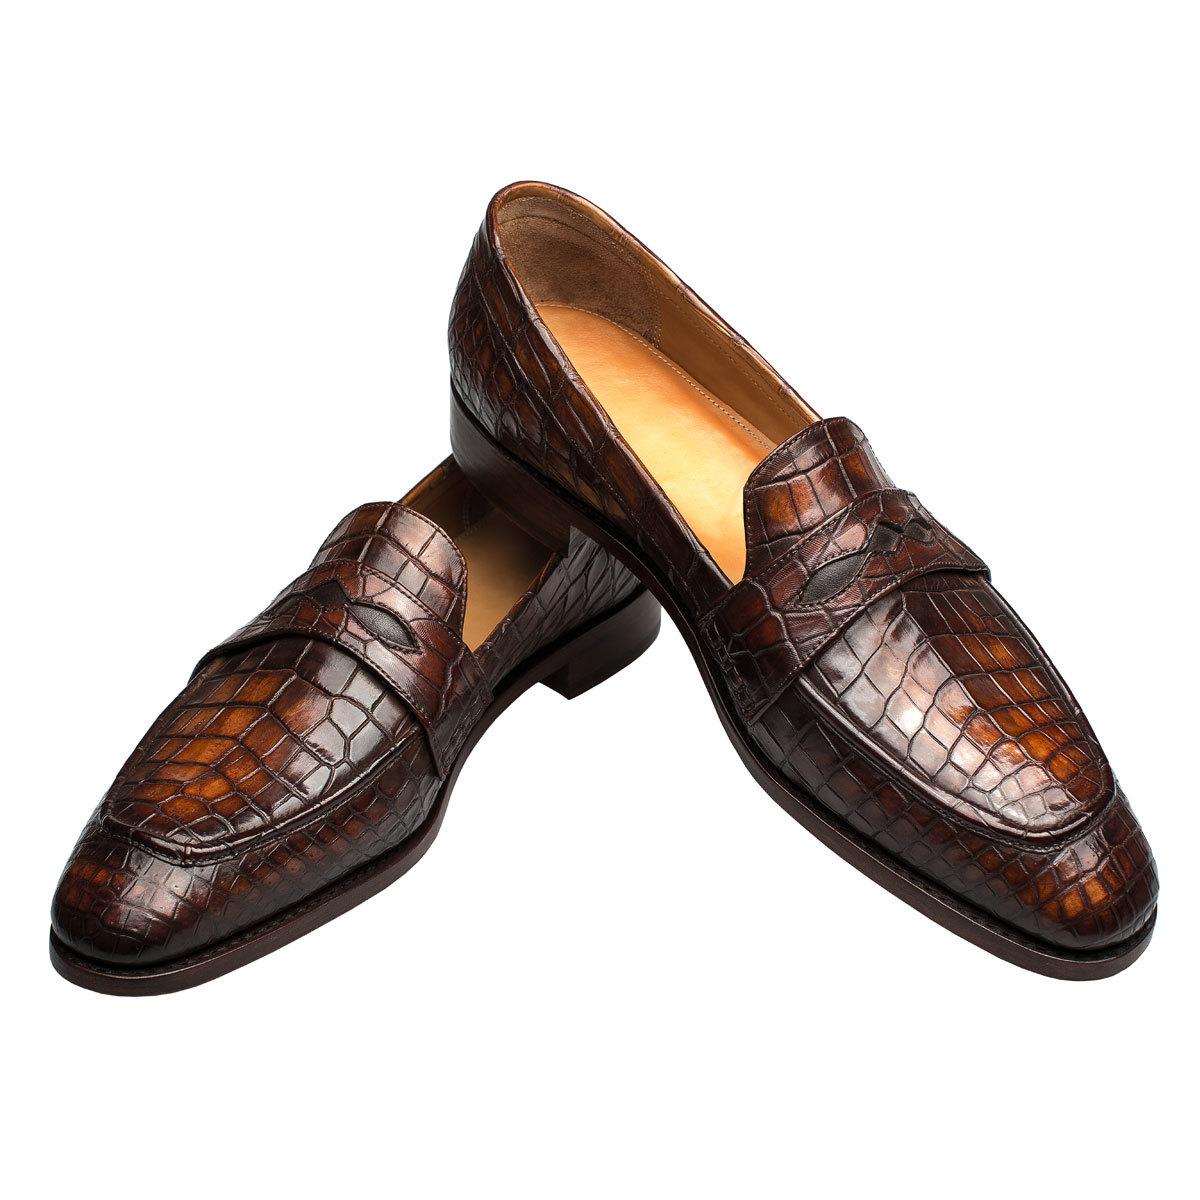 1eee5694f Мужские туфли лоферы из кожи крокодила коричневые | Артикул: MSC0403BR